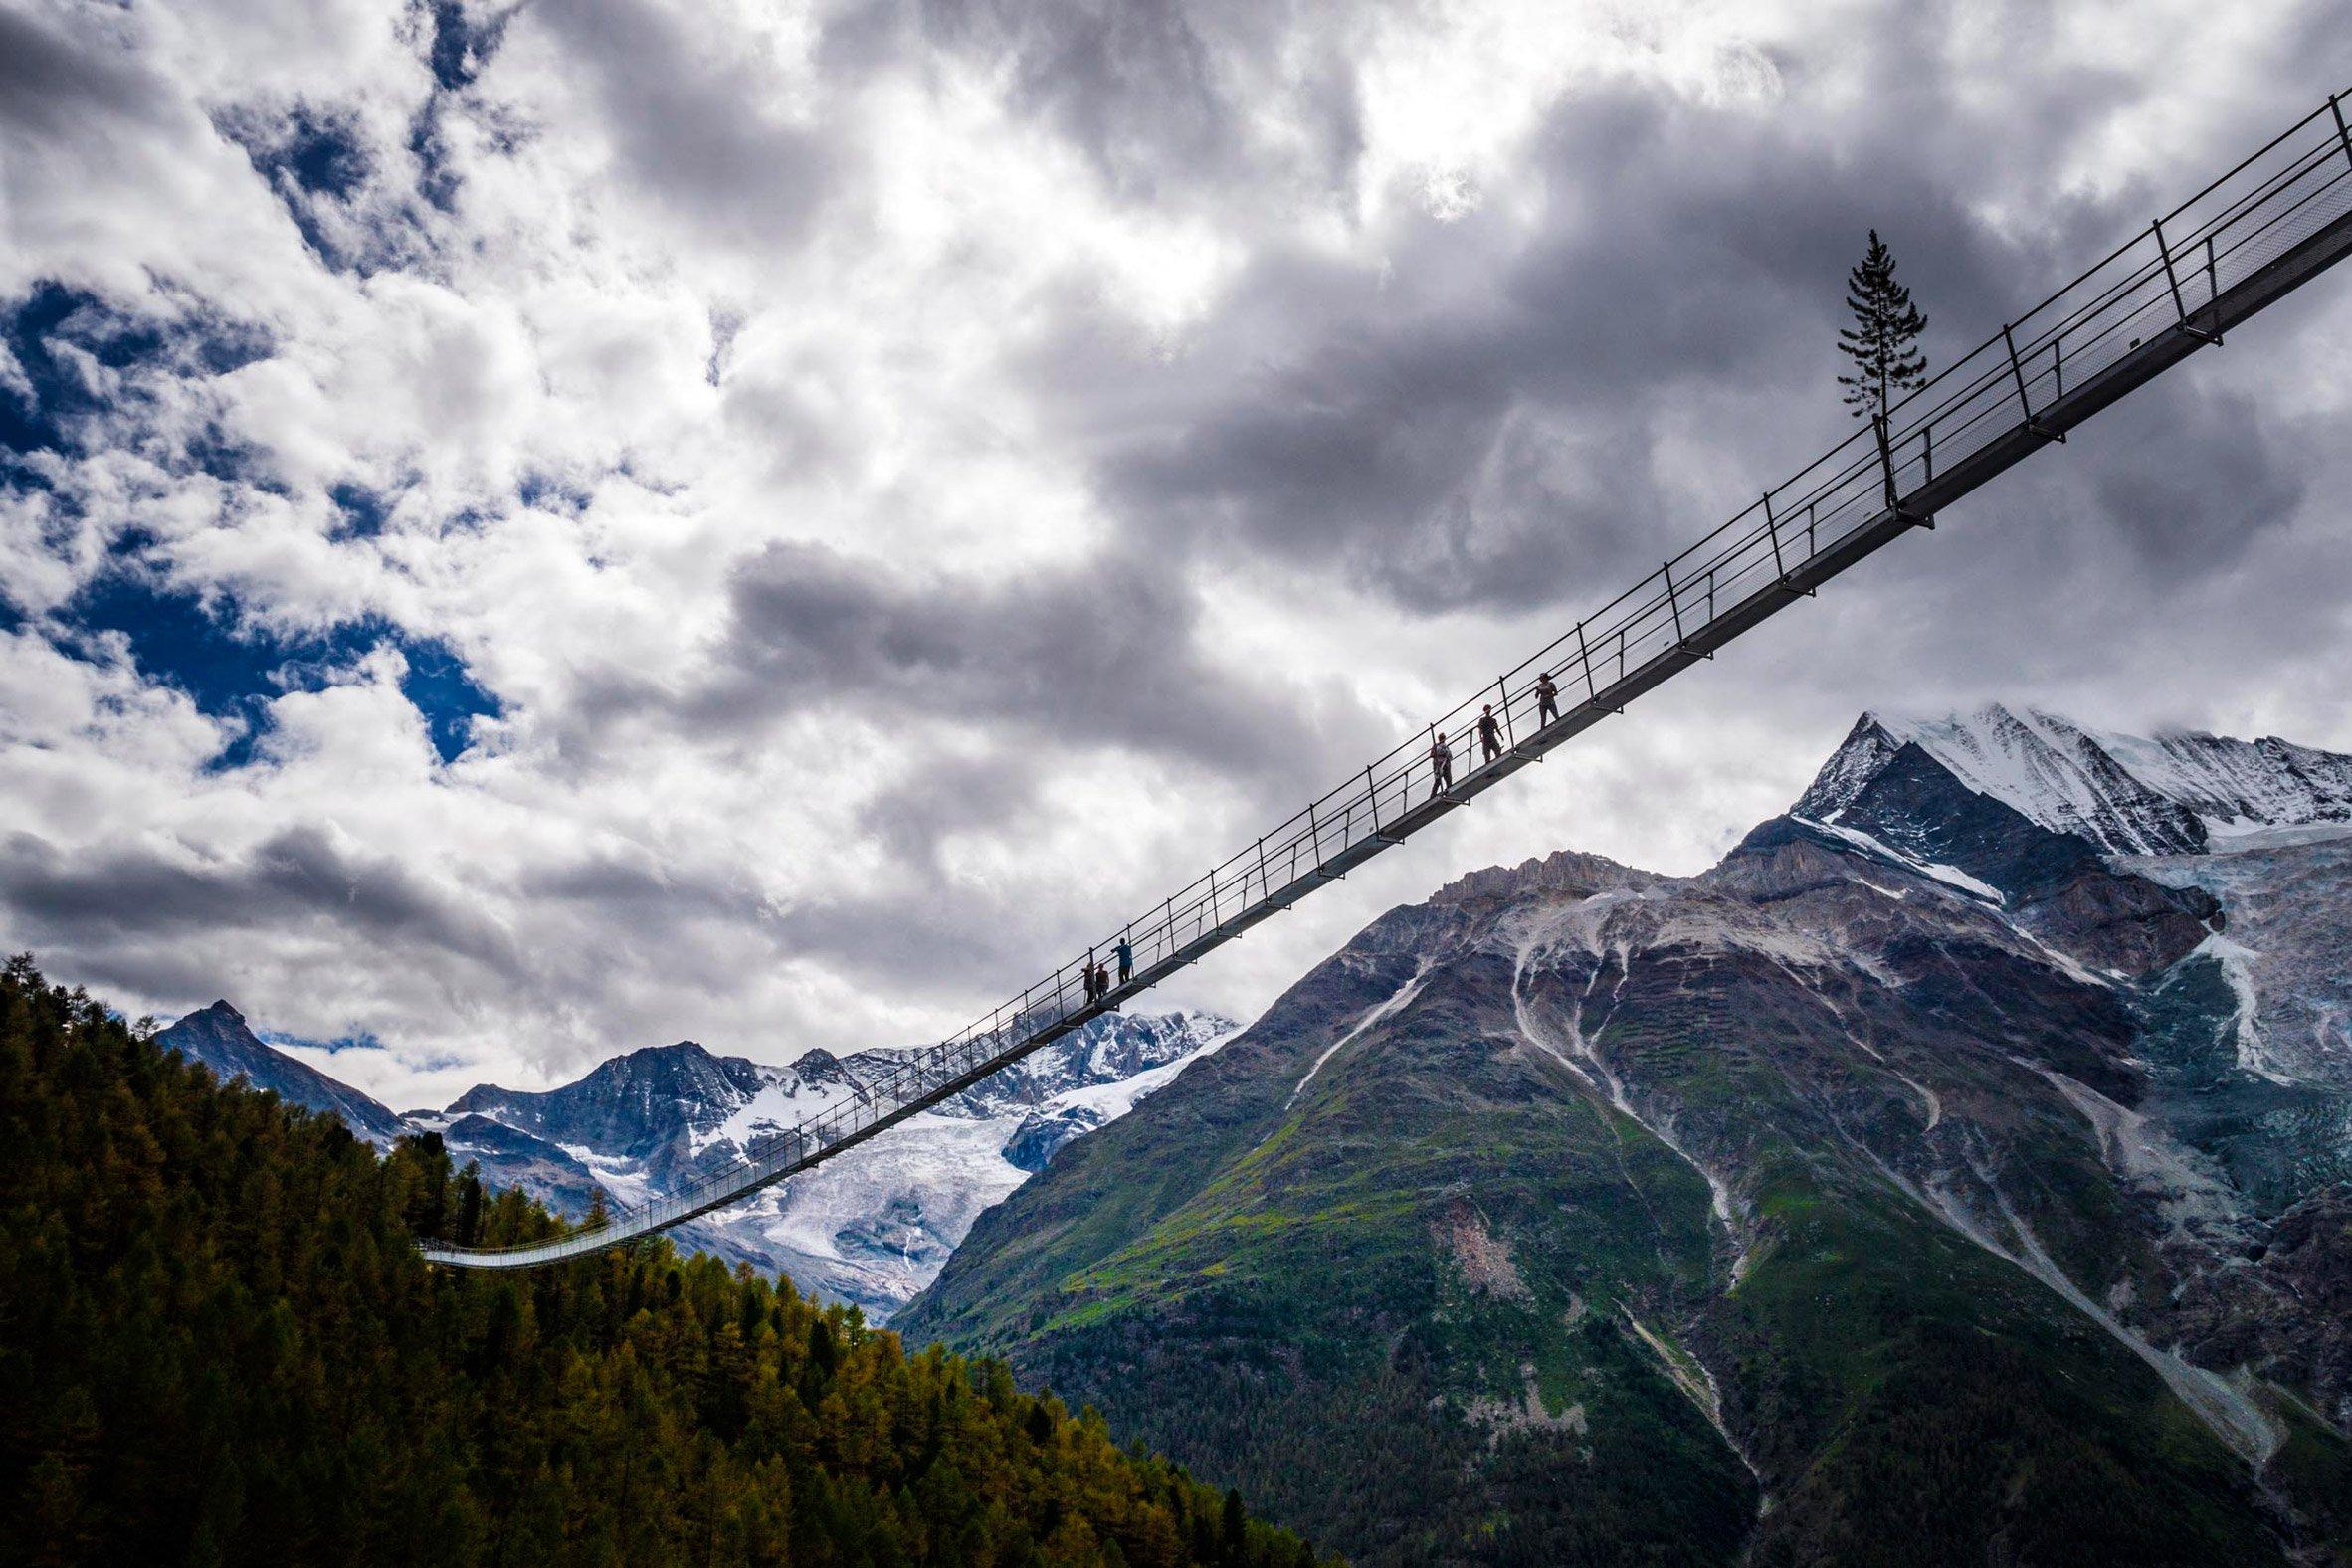 World's longest pedestrian suspension bridge traverses a Swiss valley